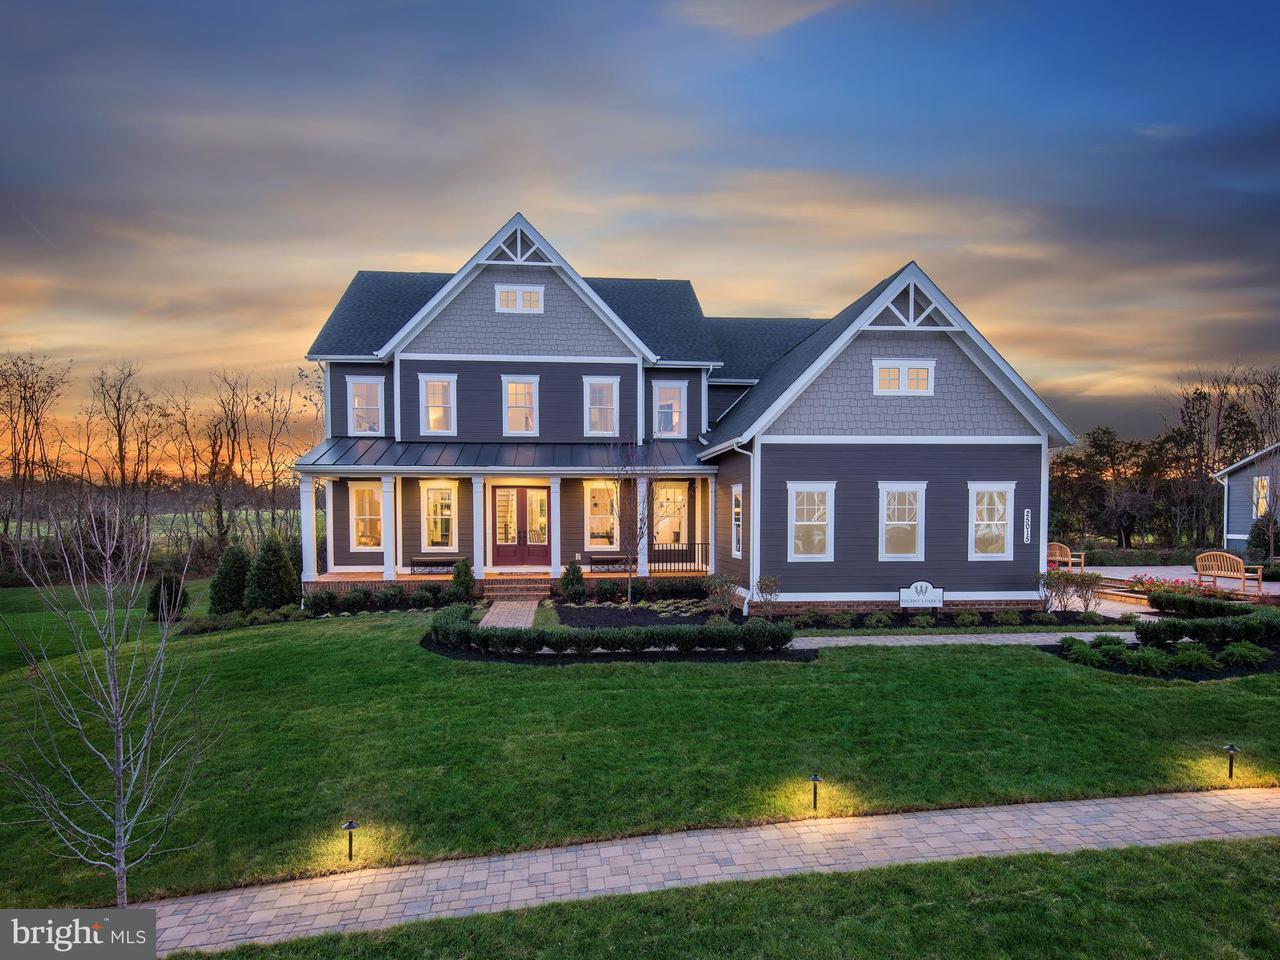 独户住宅 为 销售 在 Linwood Manor Place Linwood Manor Place 阿什伯恩, 弗吉尼亚州 20148 美国